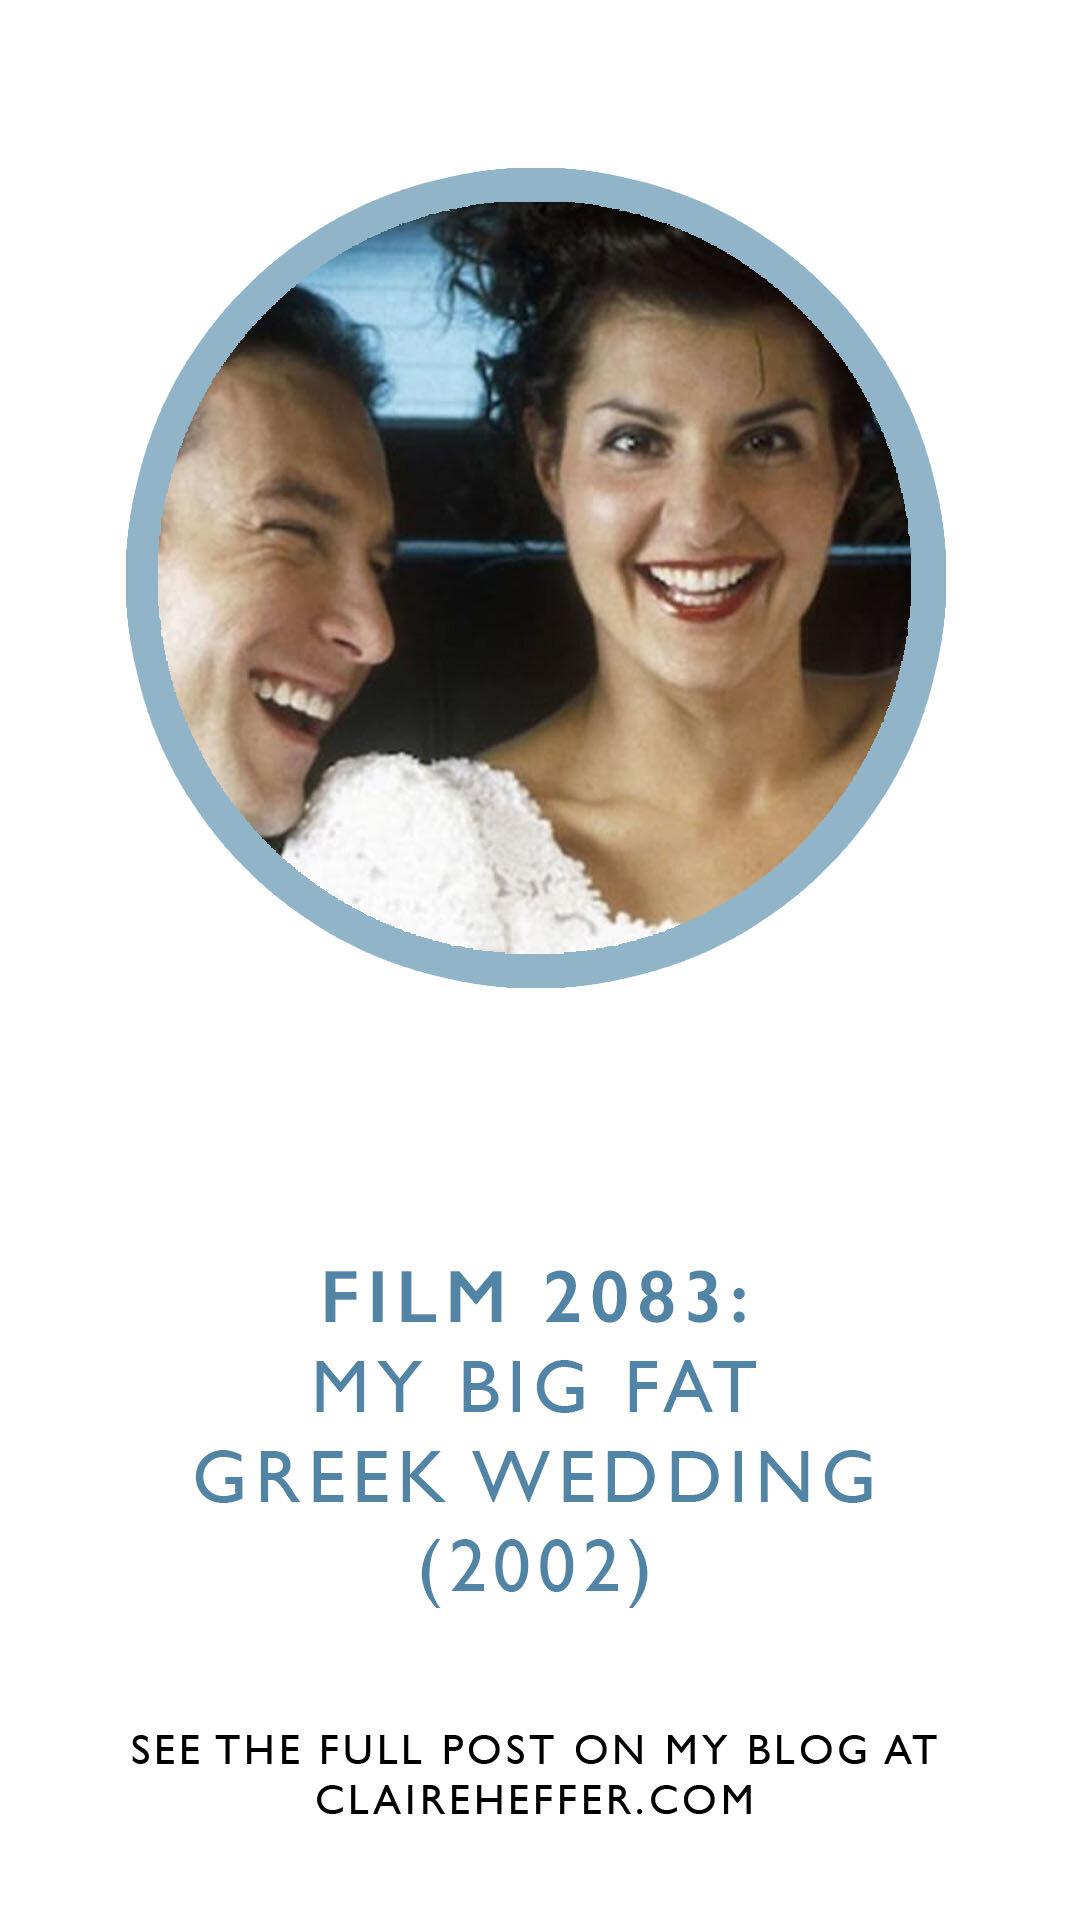 Film 2083 My Big Fat Greek Wedding 2002 Claire Heffer Design